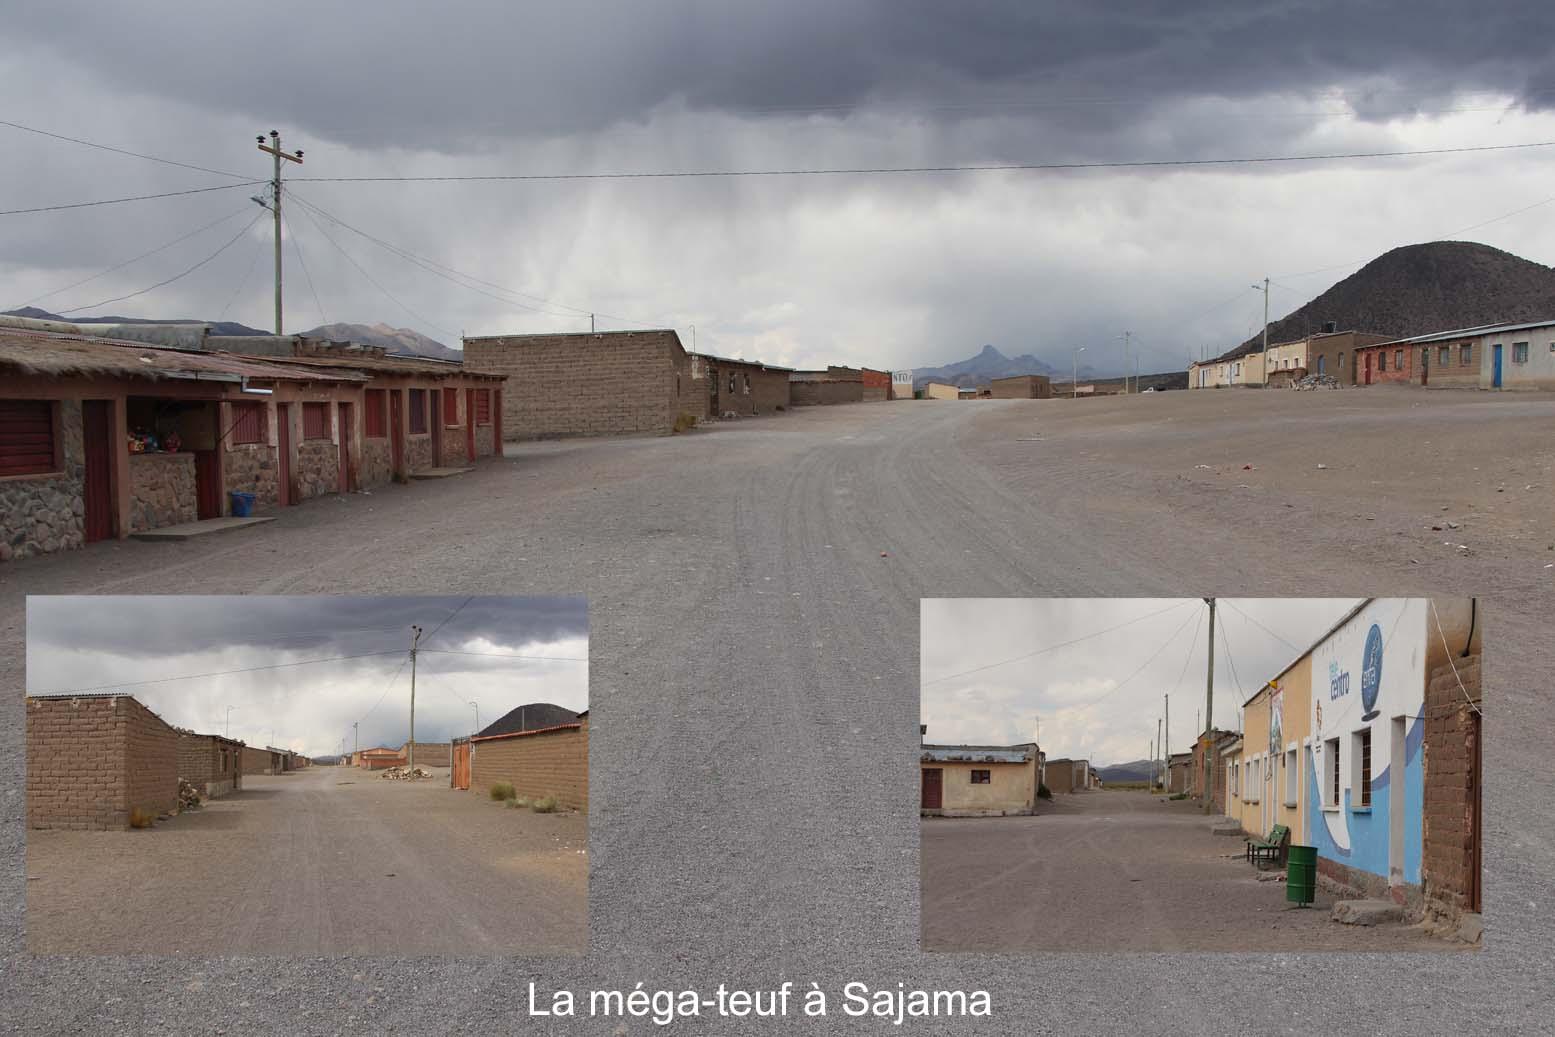 Sajama village